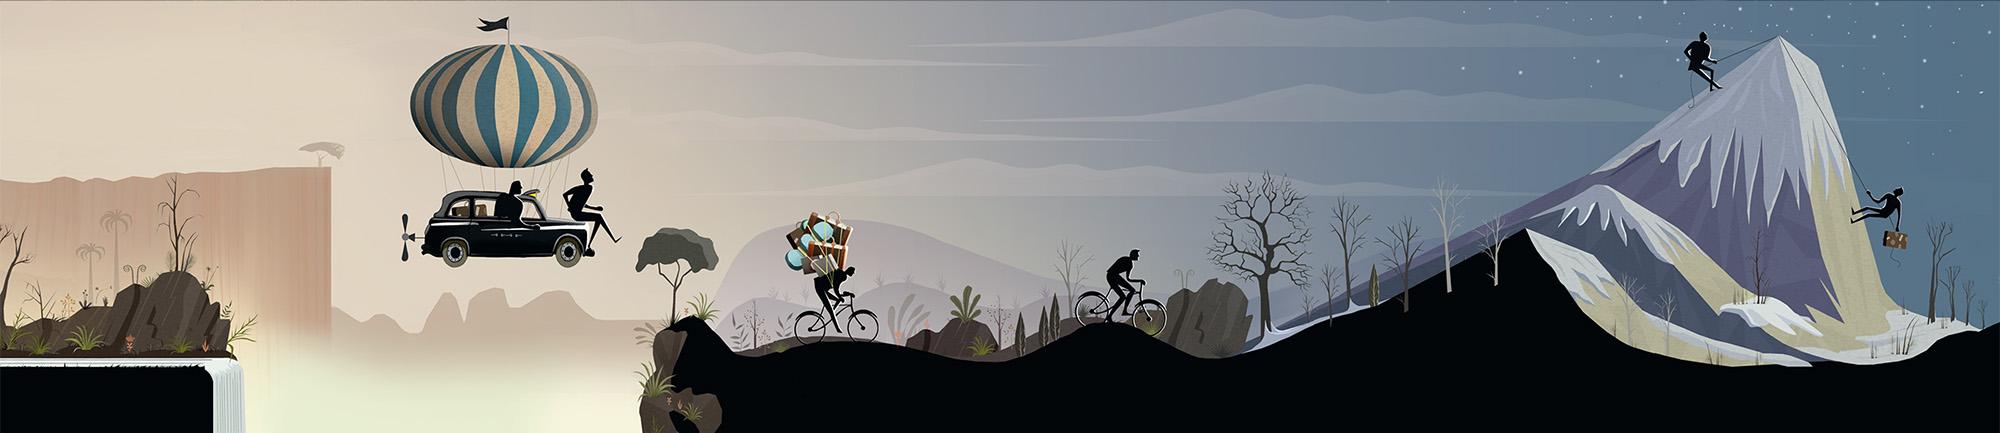 Punter Southall journey illustration 2